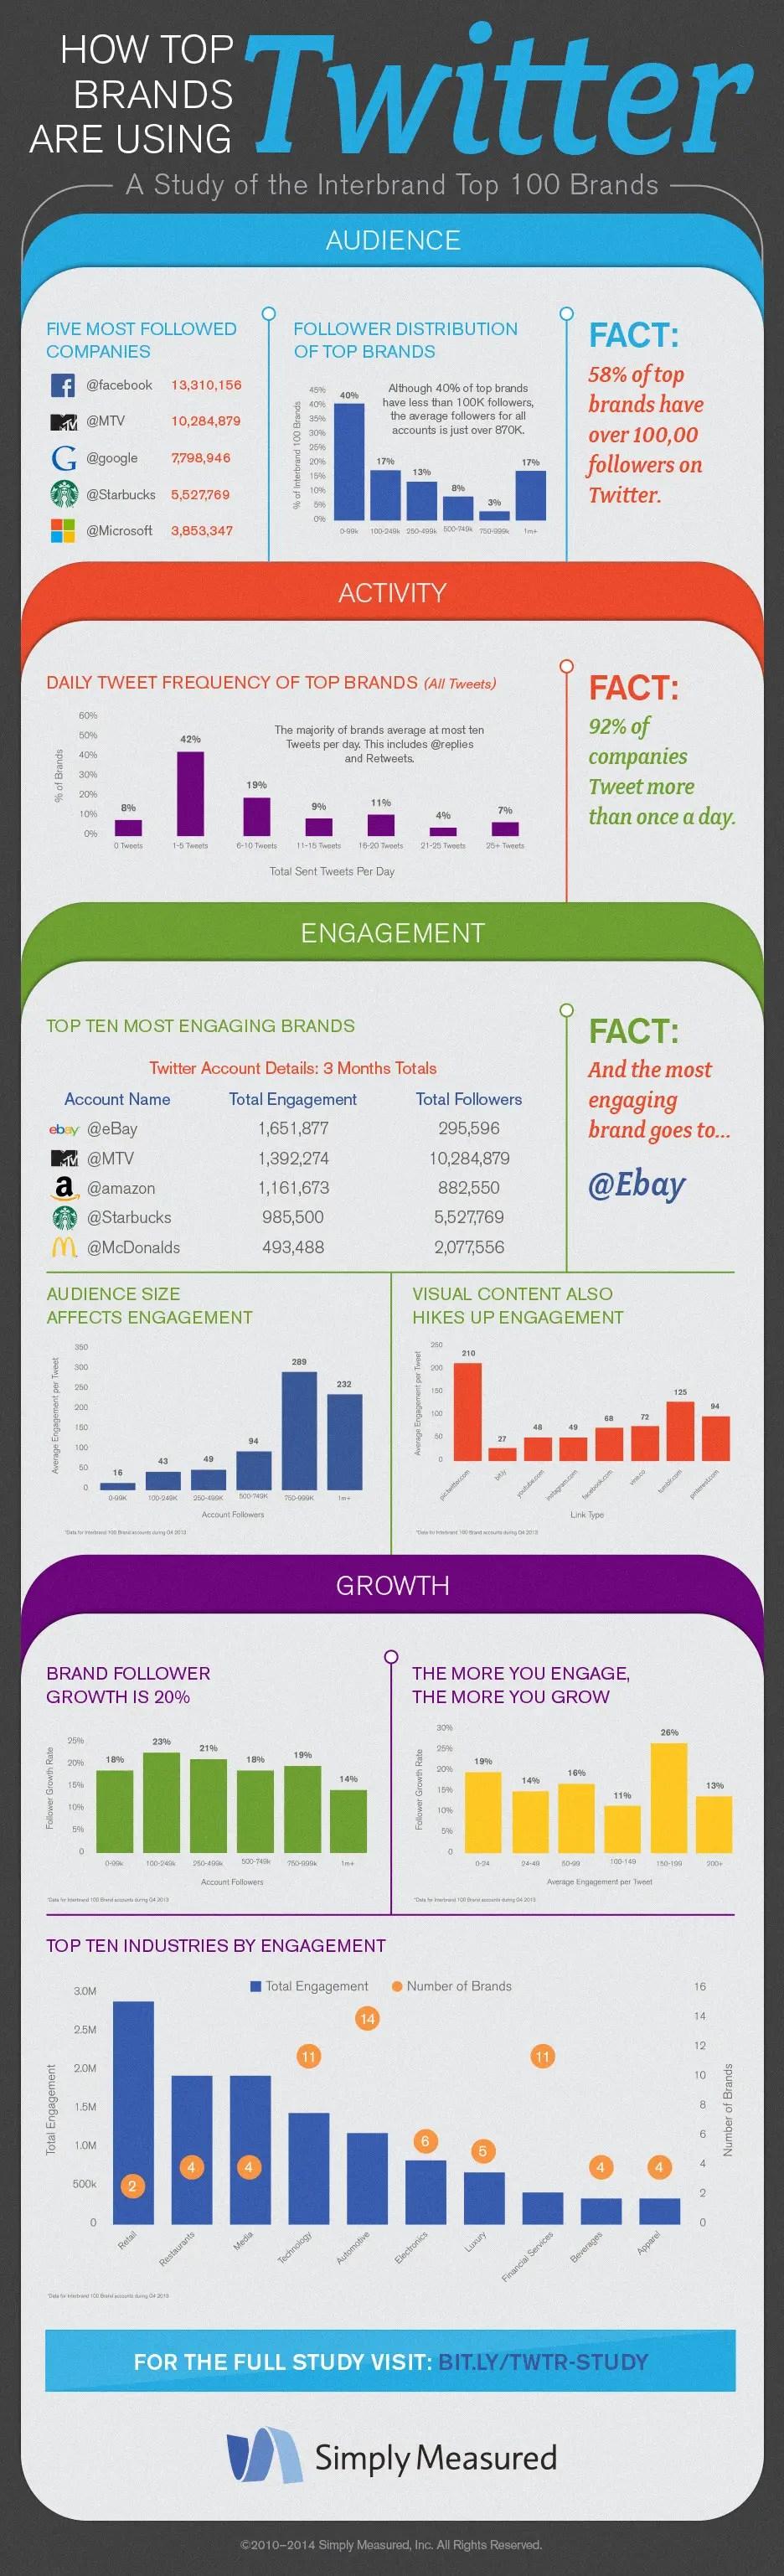 wersm_simplymeasured_infographic_twitter